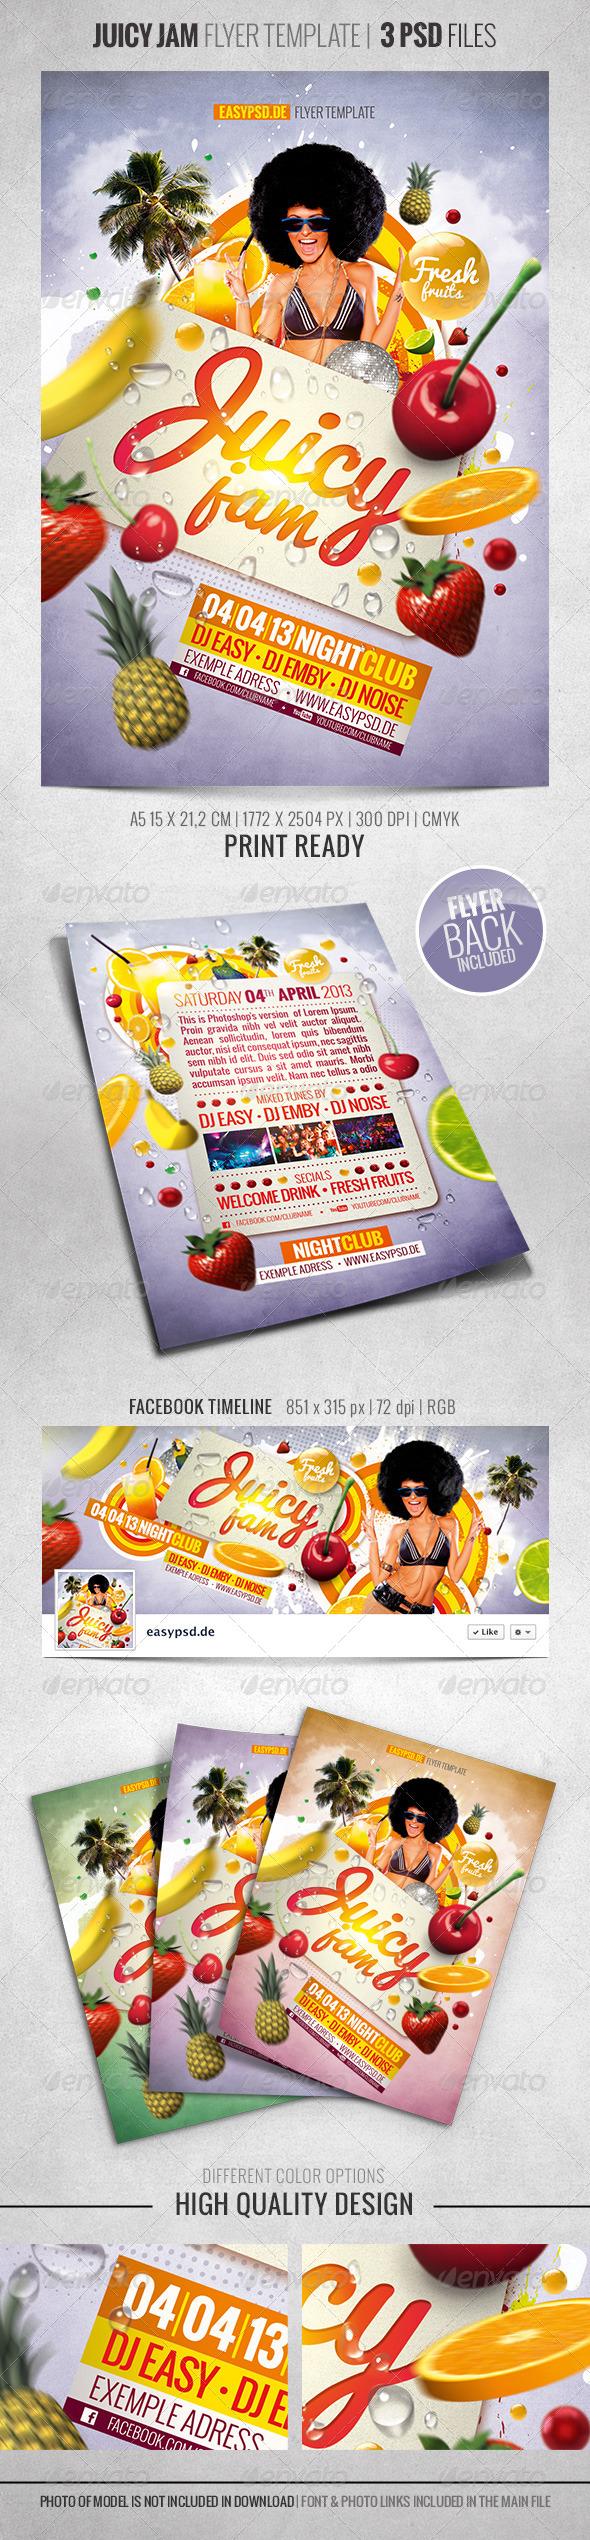 GraphicRiver Juicy Jam Flyer Template 4152020